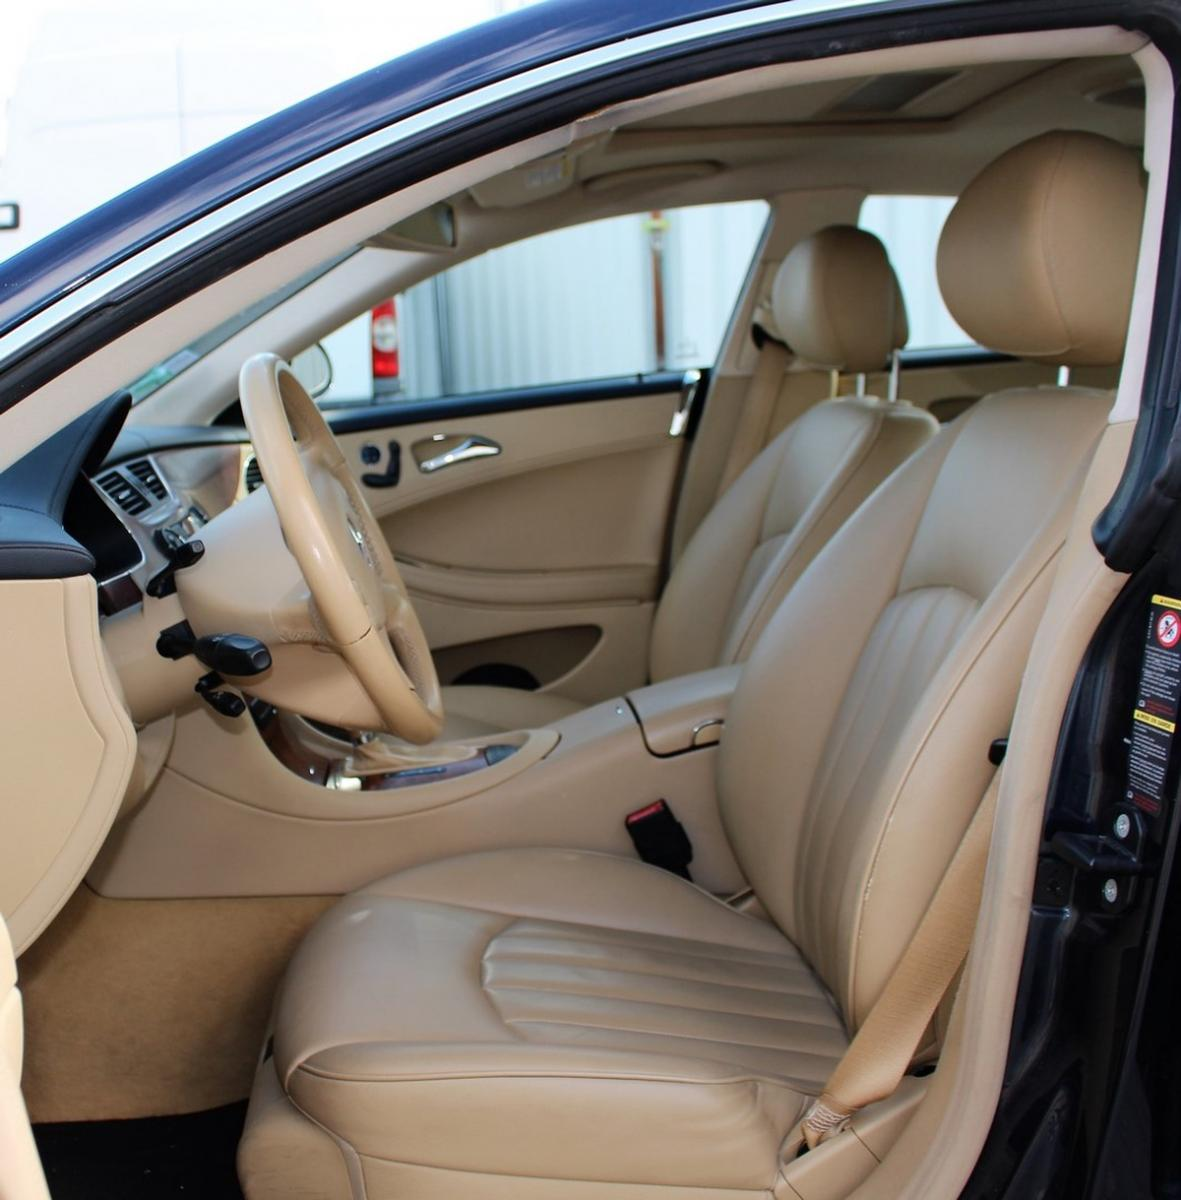 Mercedes Classe Cls 320 CDi 224 cv AVANTGARDE